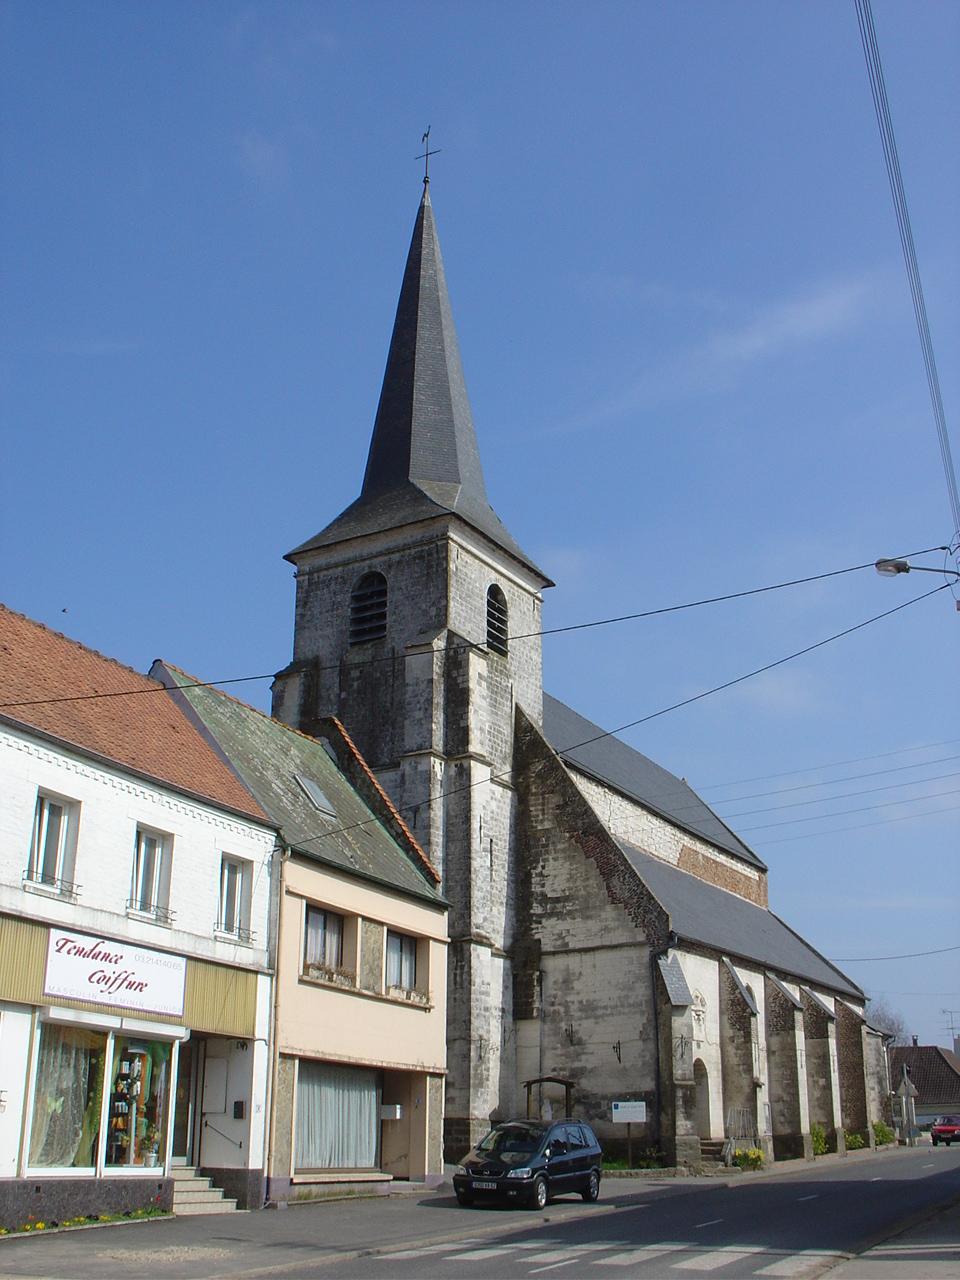 Blangy-sur-Ternoise